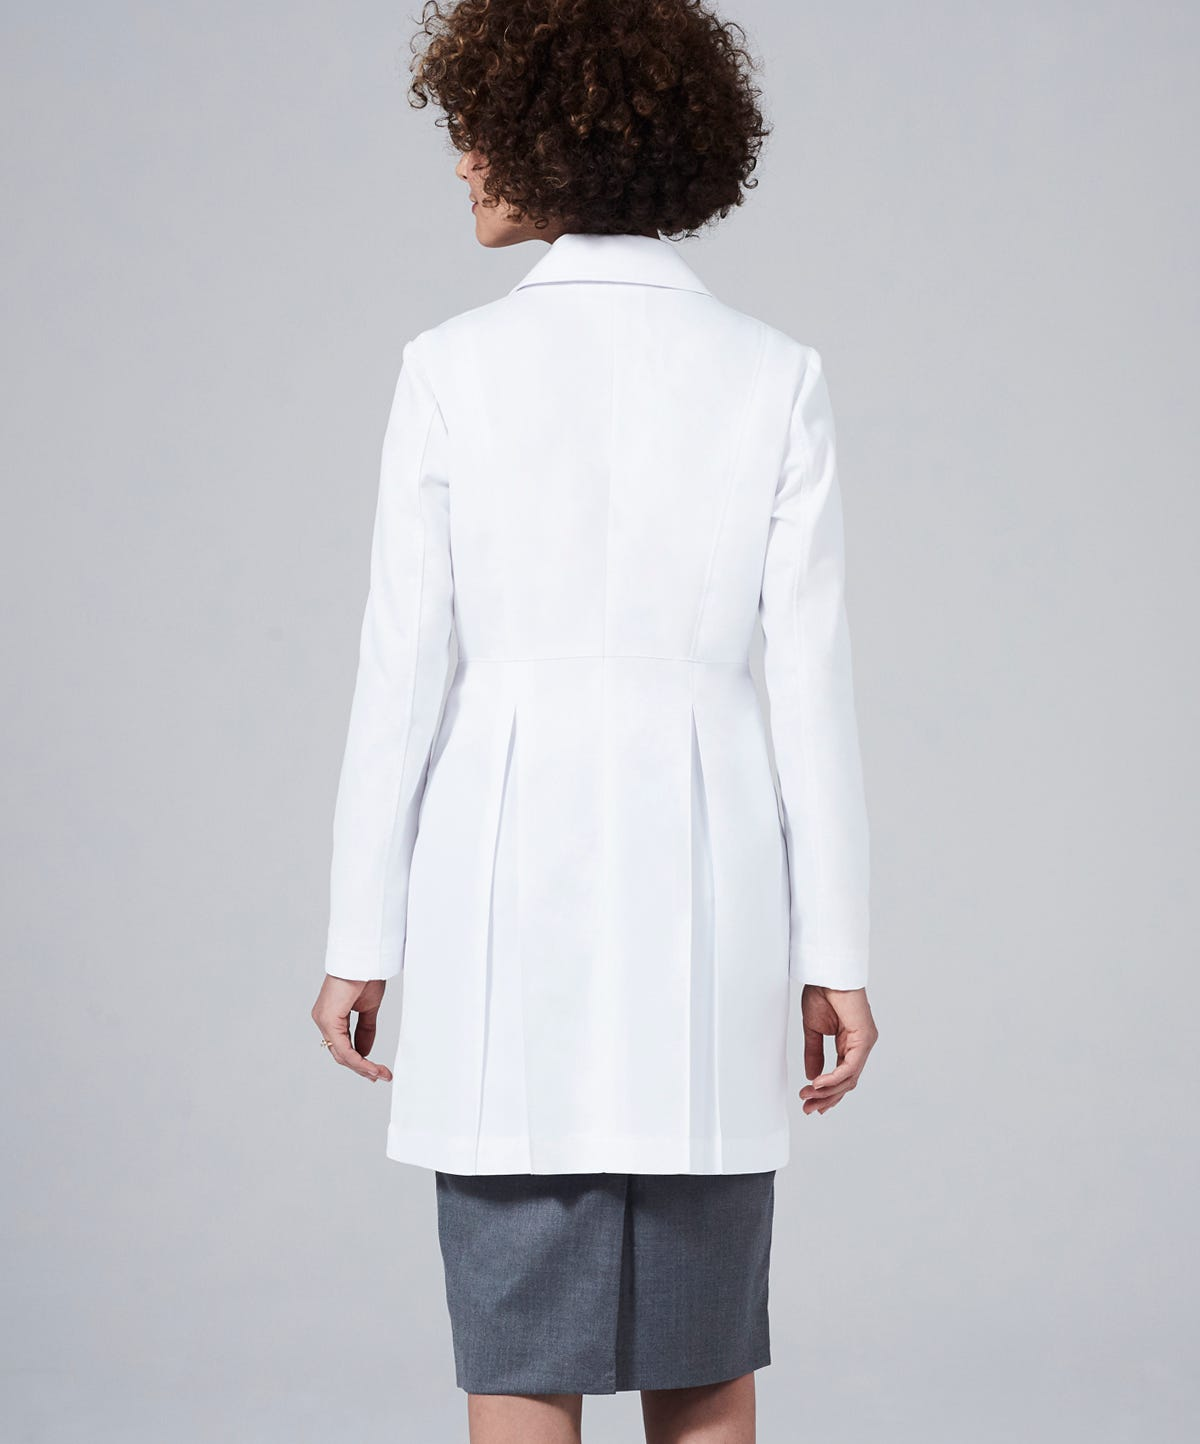 White lab apron -  M3 Miranda B Slim Fit Lab Coat